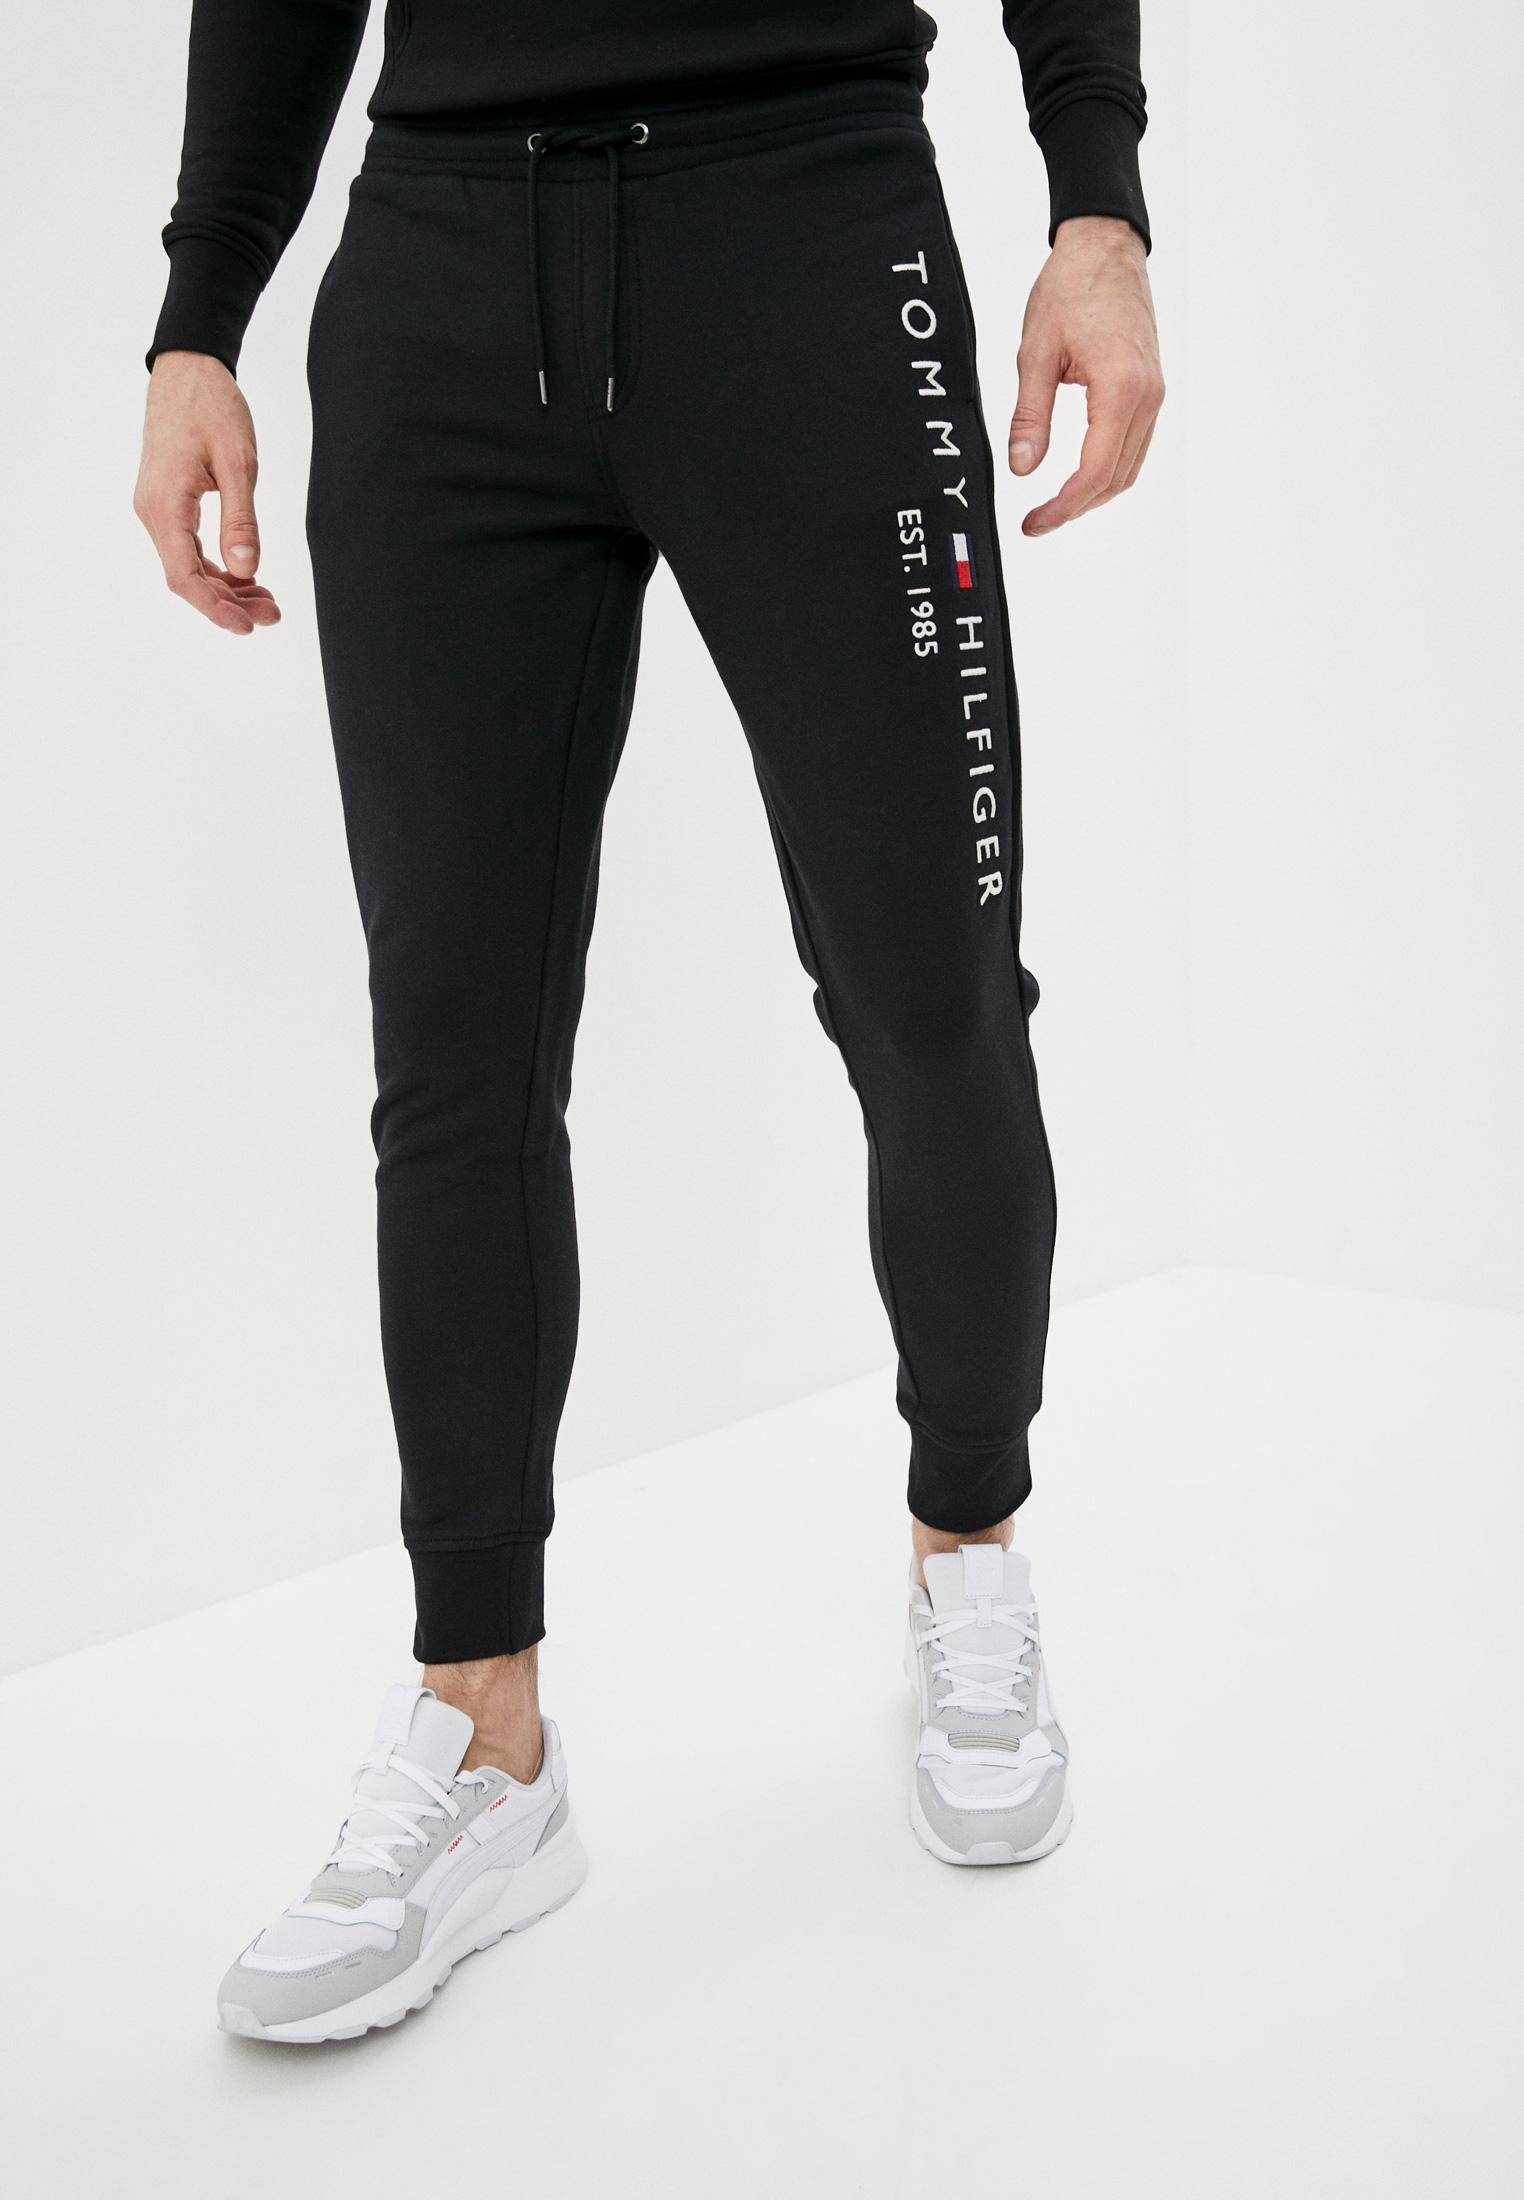 Мужские спортивные брюки Tommy Hilfiger (Томми Хилфигер) MW0MW08388